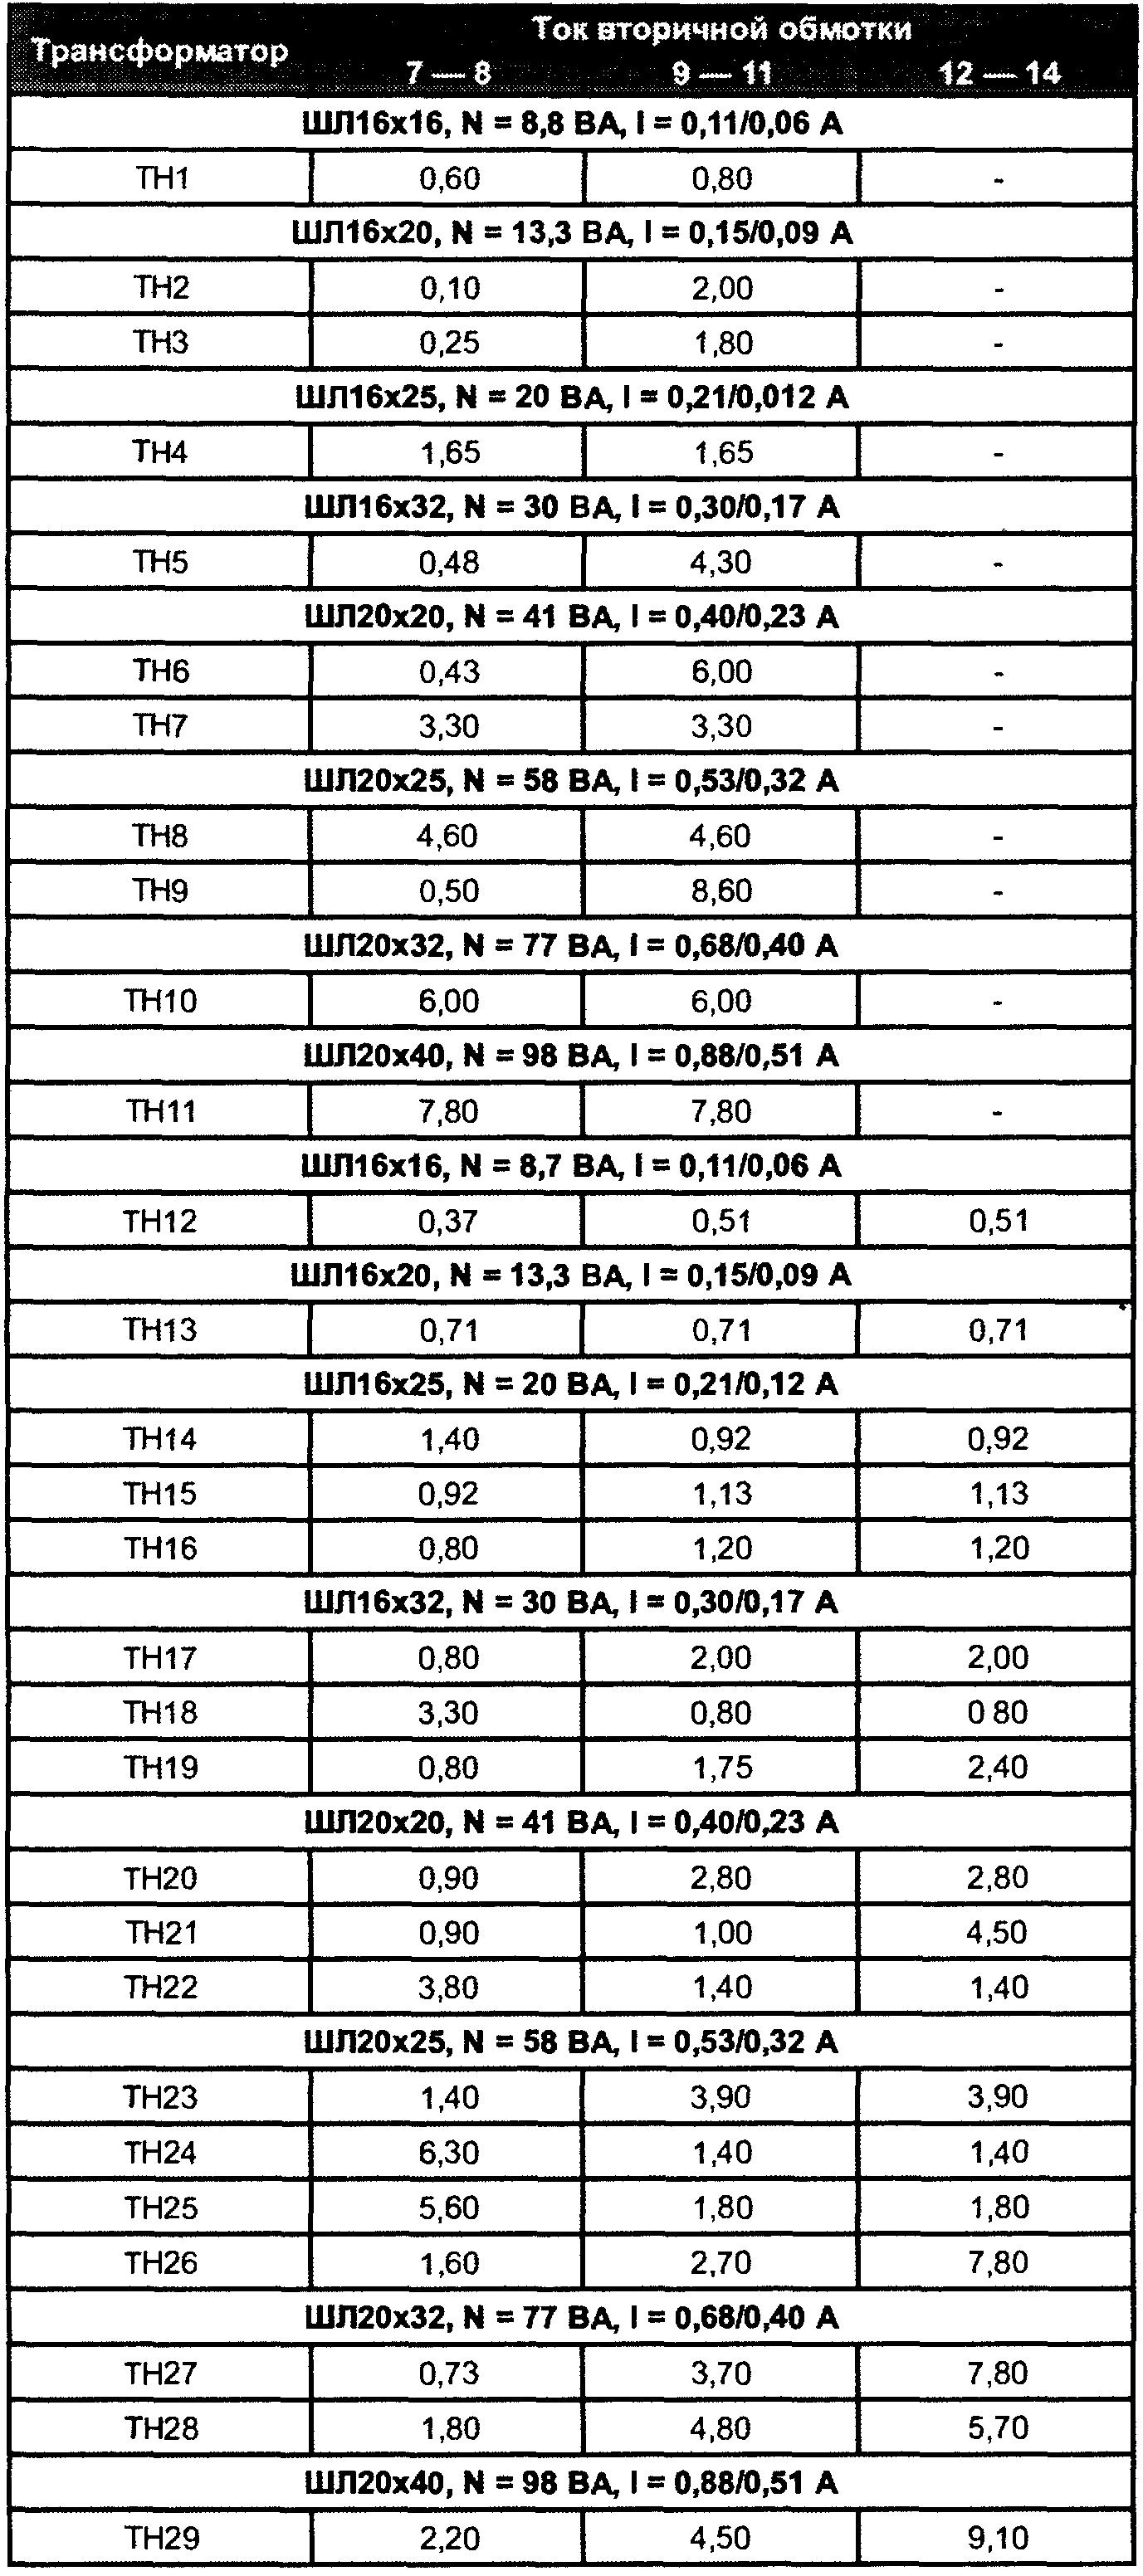 трансформаторы ТН